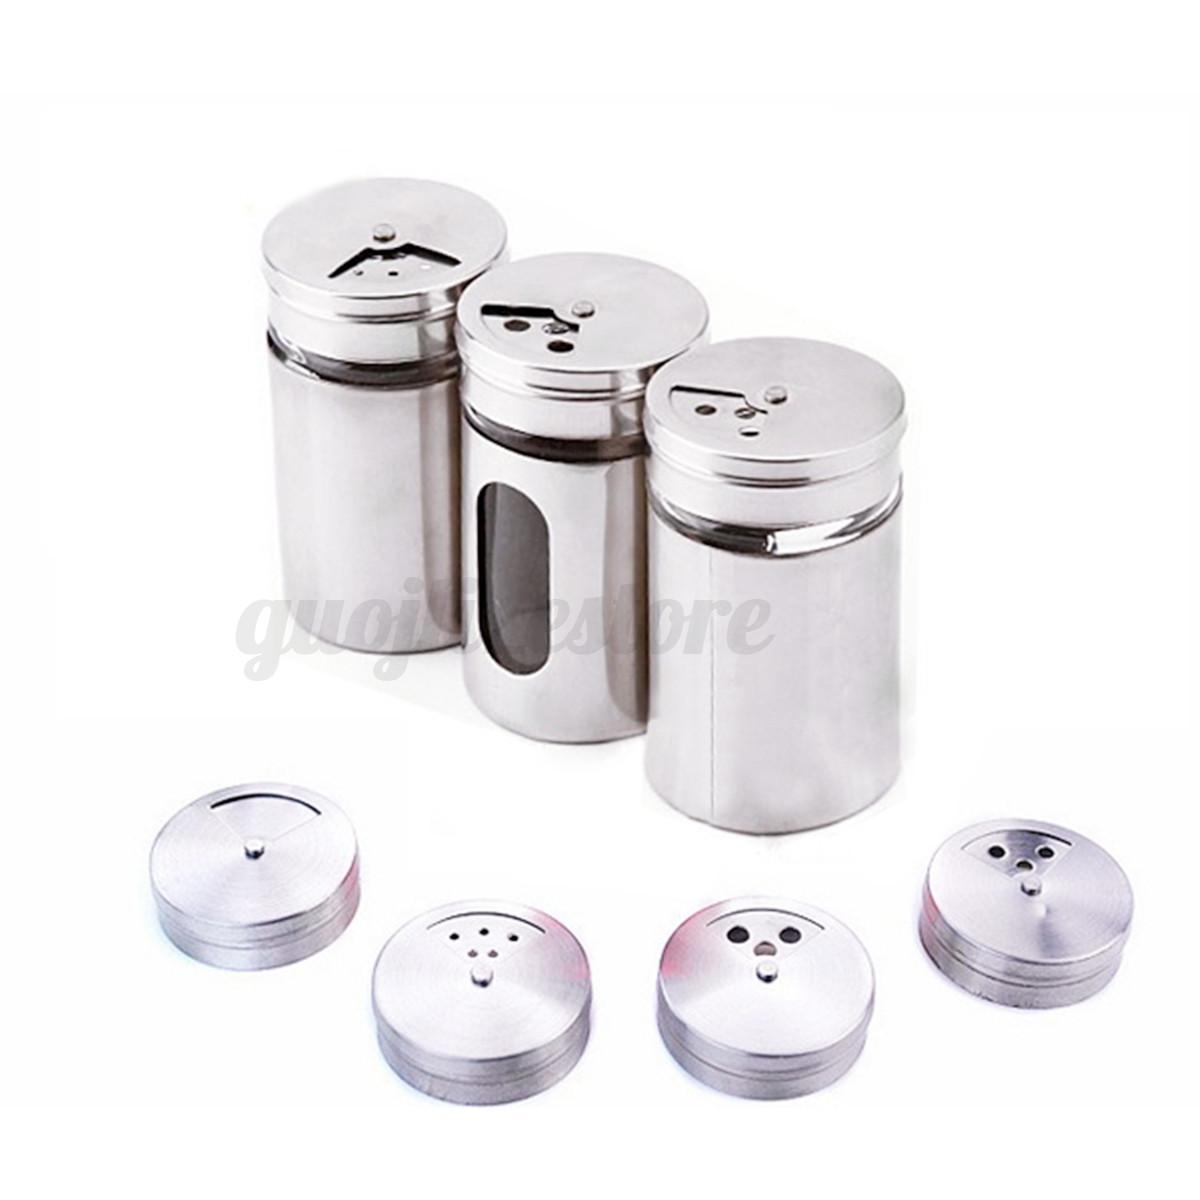 Stainless steel spice shaker sugar salt pepper herb toothpick storage bottle ebay - Toothpick shaker ...